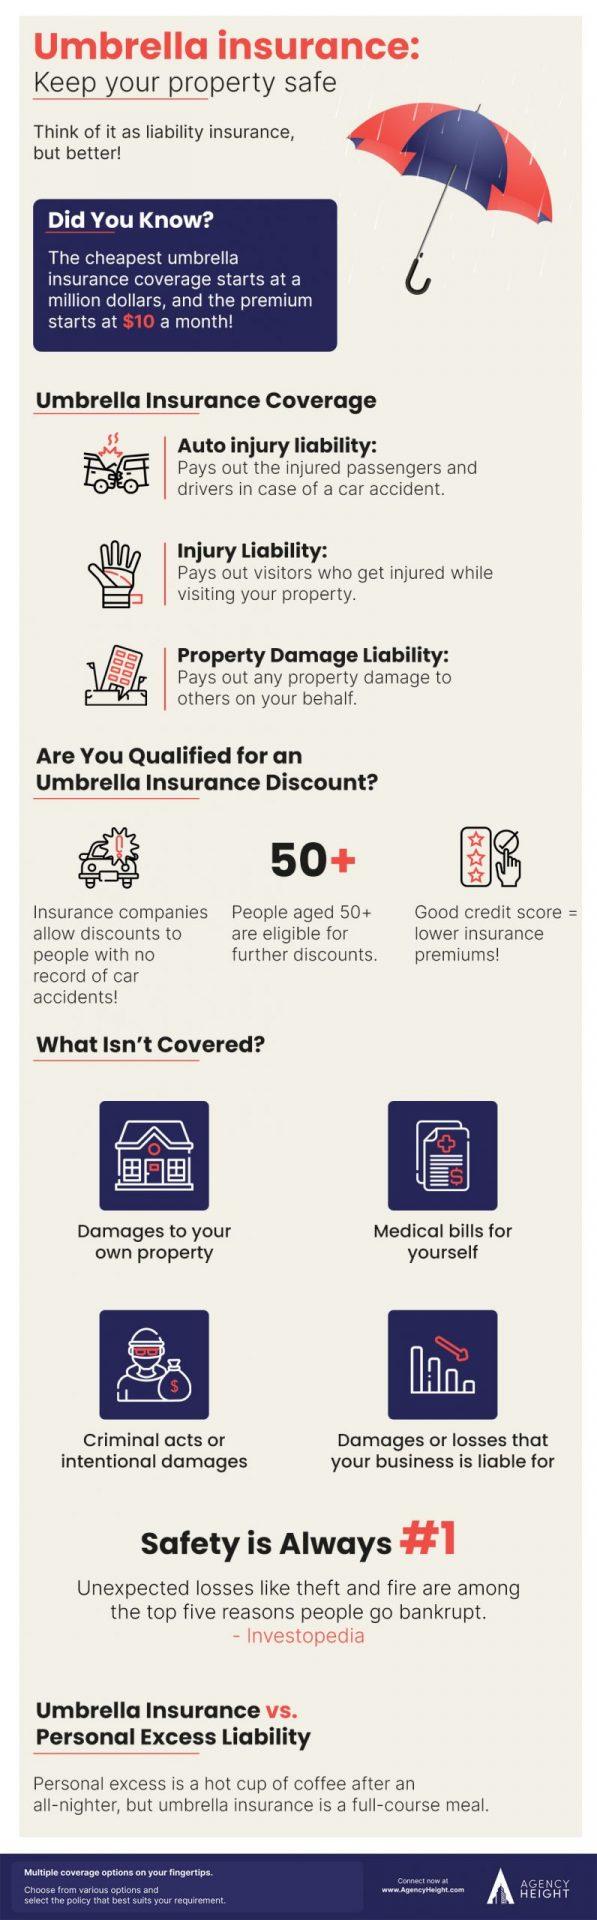 infographic umbrella insurance